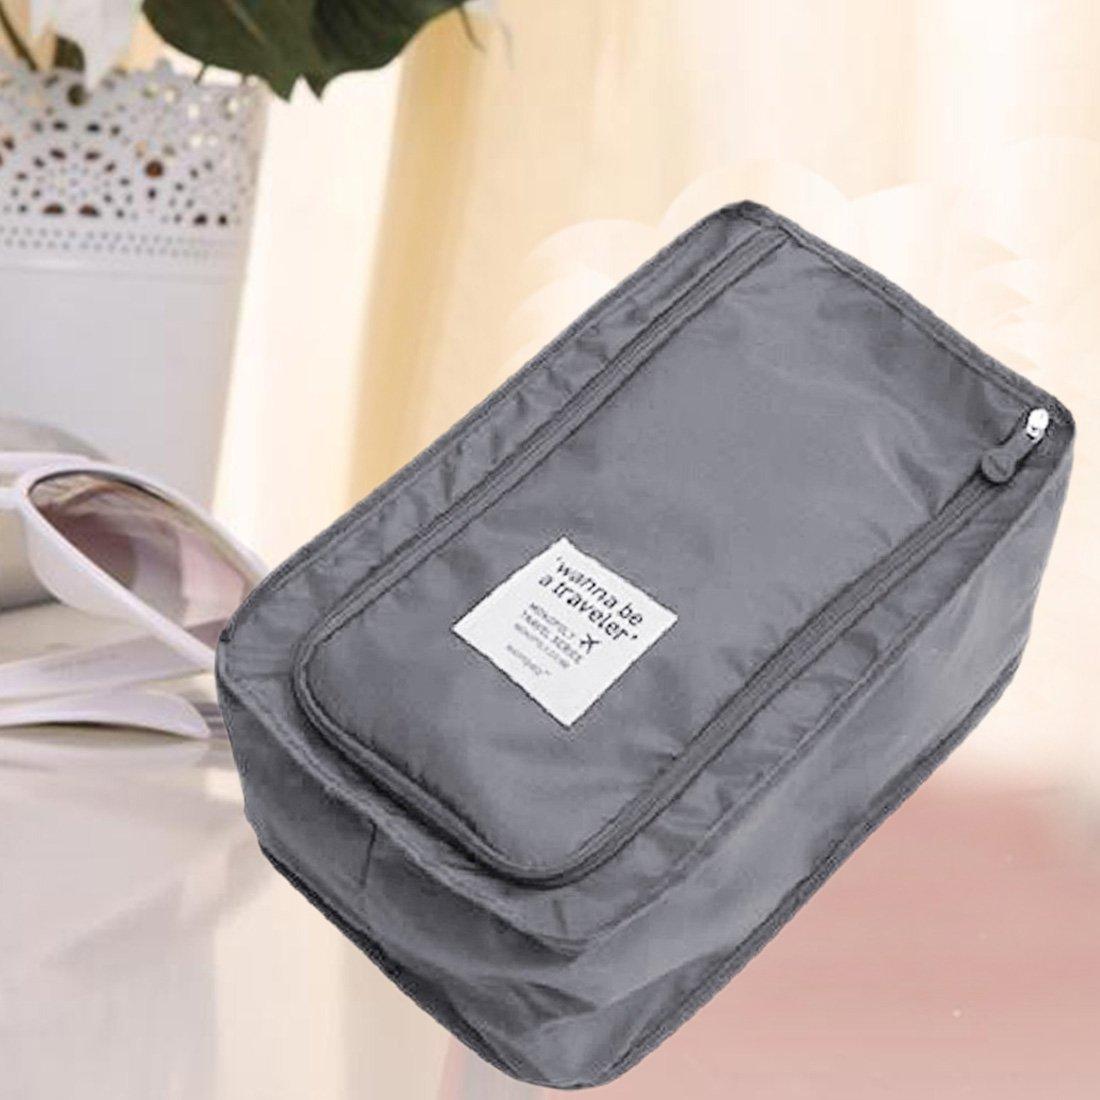 Portable Tote Shoes Pouch Waterproof Storage Bag Ver.3 Makeup Hangbag Comesitc Travel Organiser